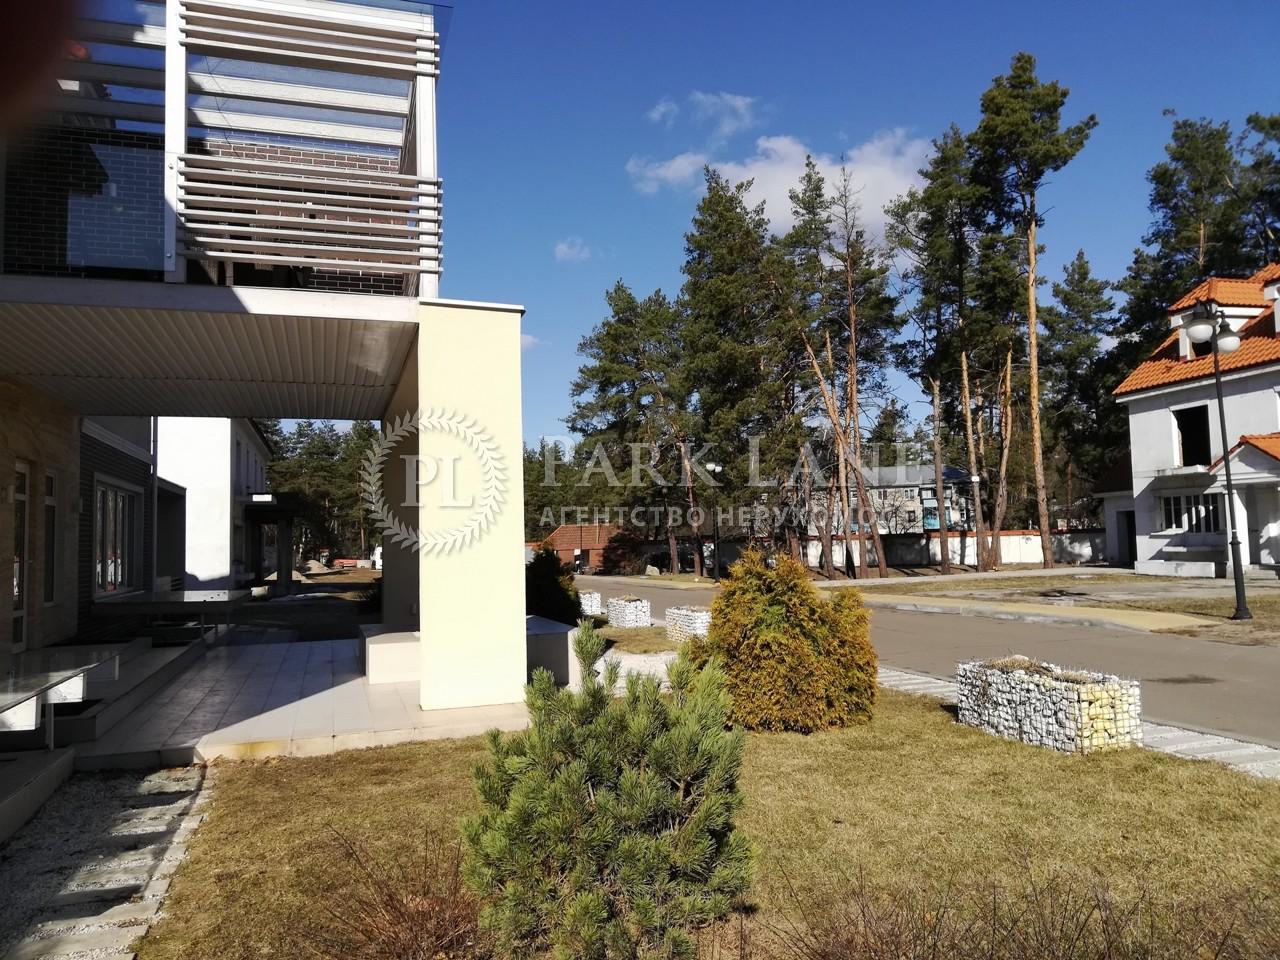 Квартира Столичное шоссе, 149, Киев, K-30779 - Фото 9